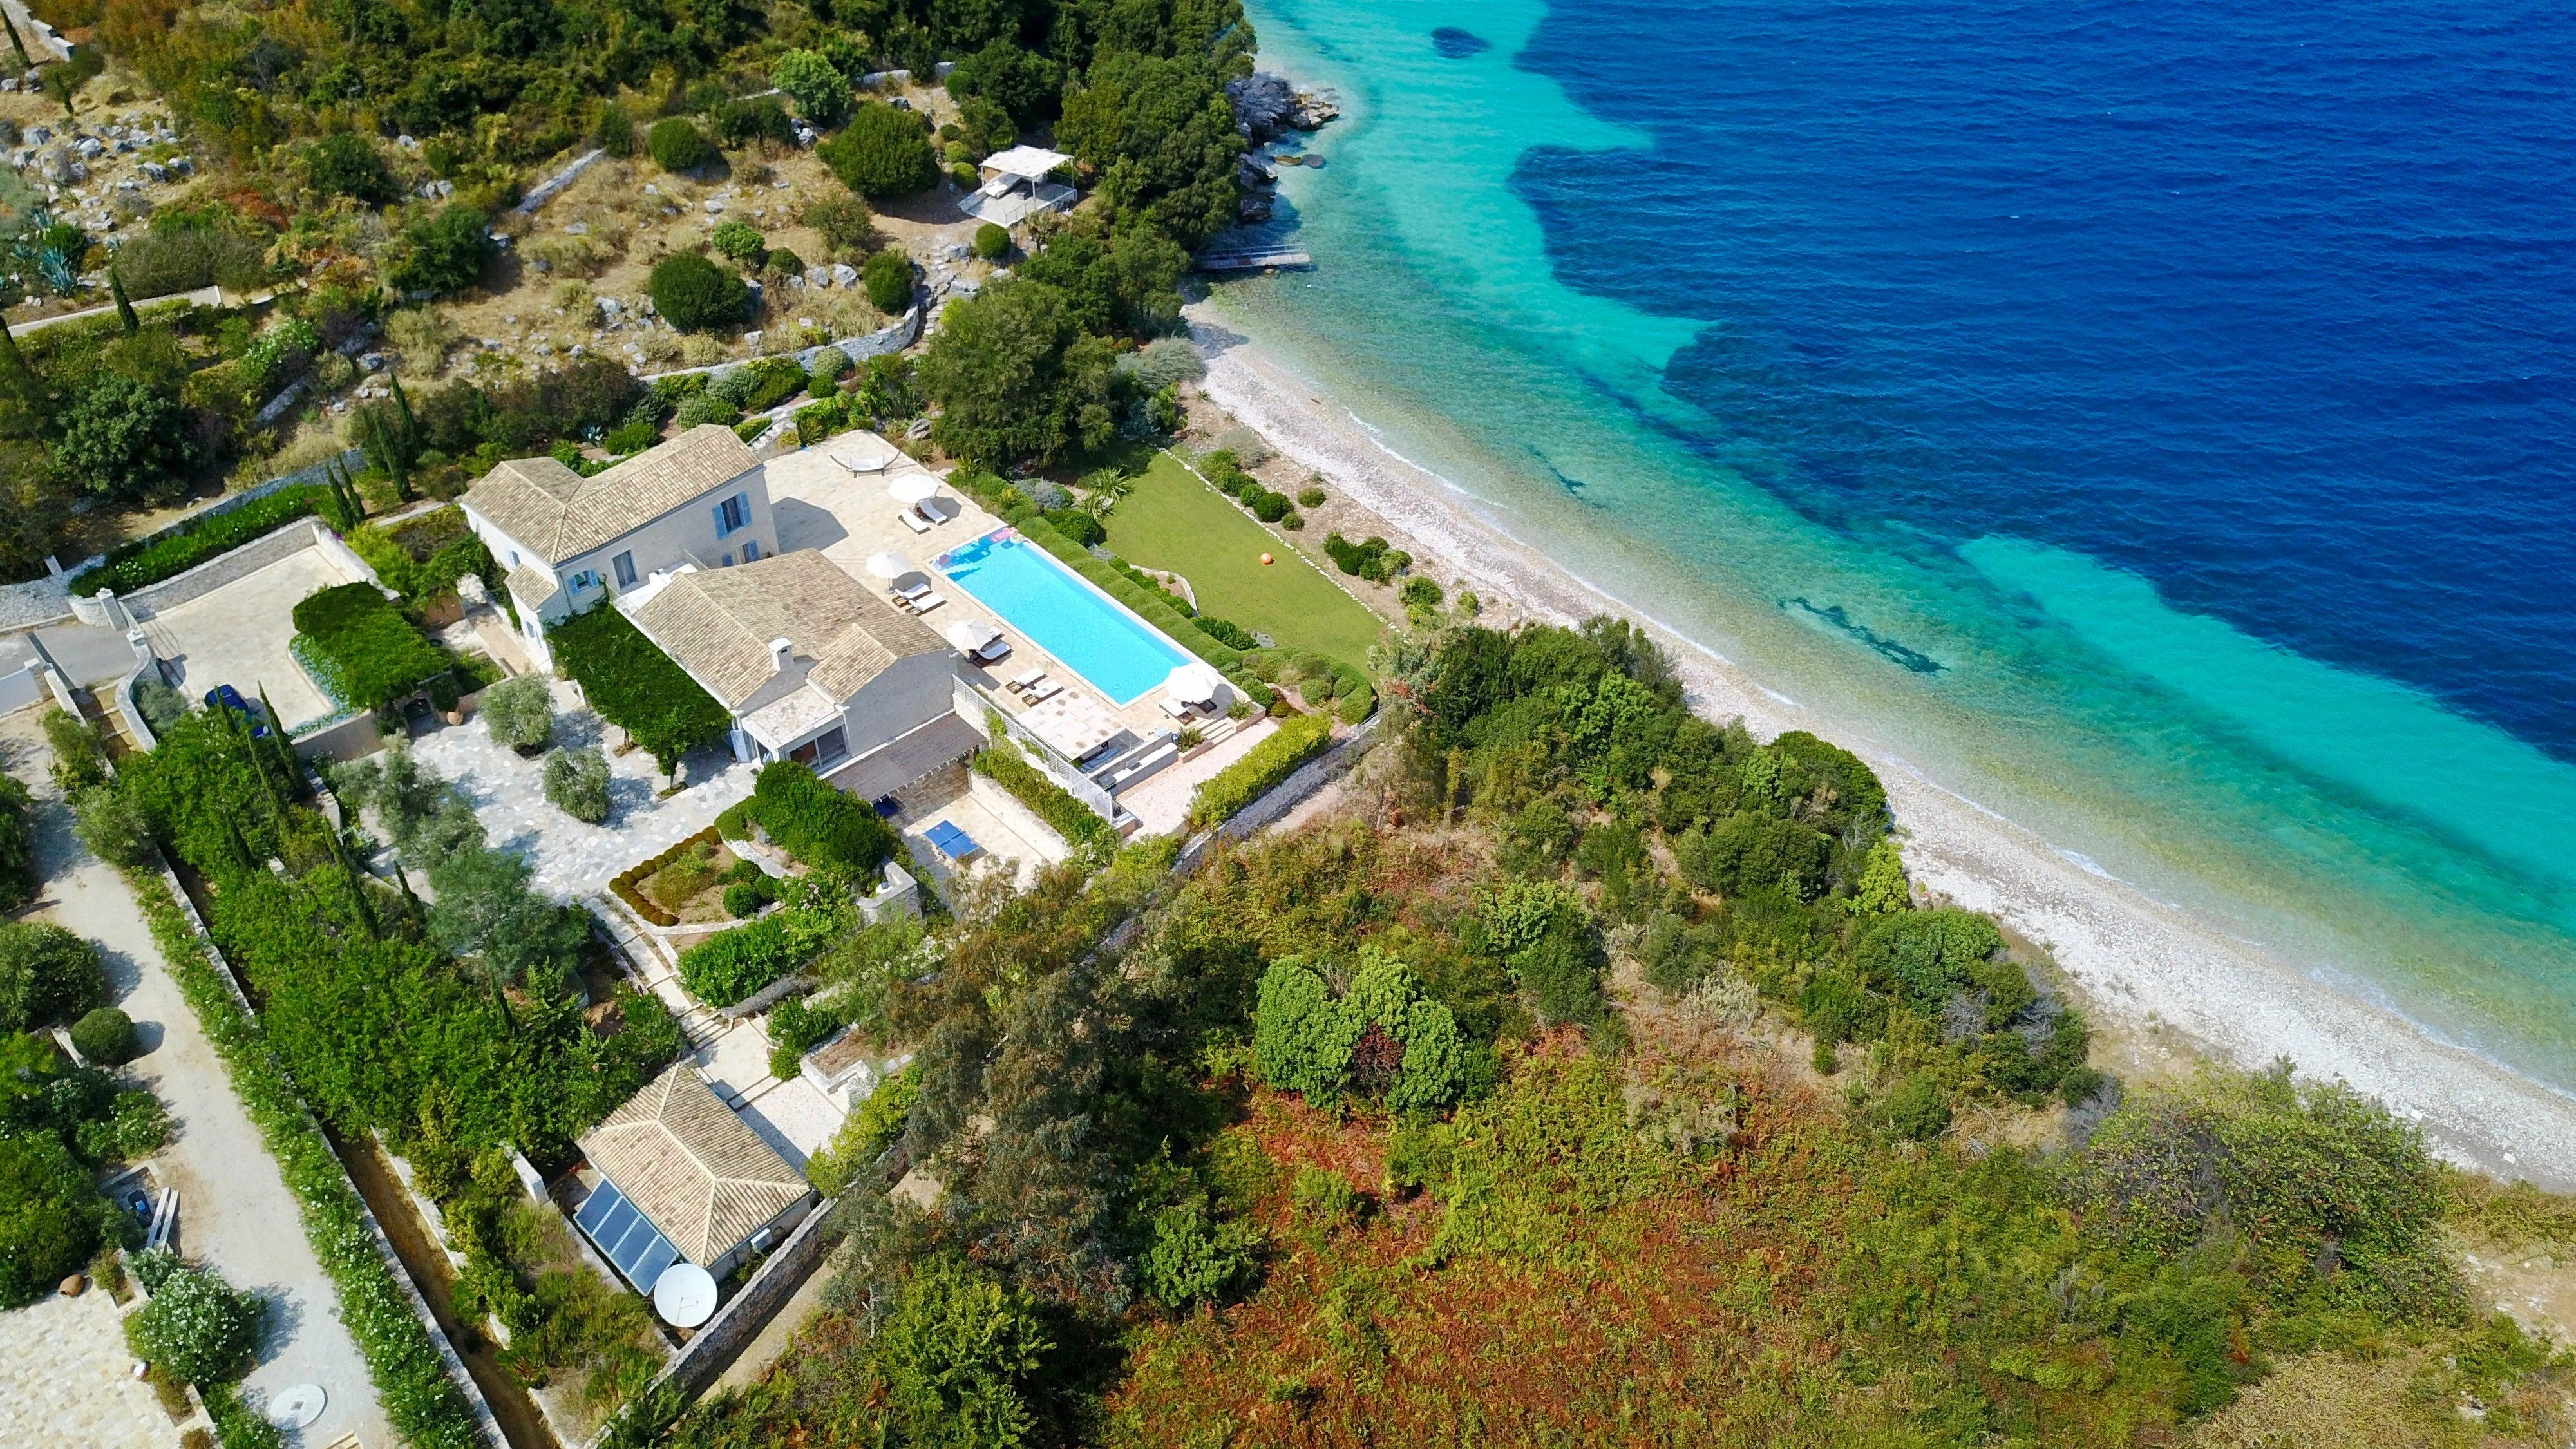 Sotheby's Greece: Τριπλασιασμός πωλήσεων το 2018 - Ρεκόρ σε Μύκονο, Παξούς, Νάξο,